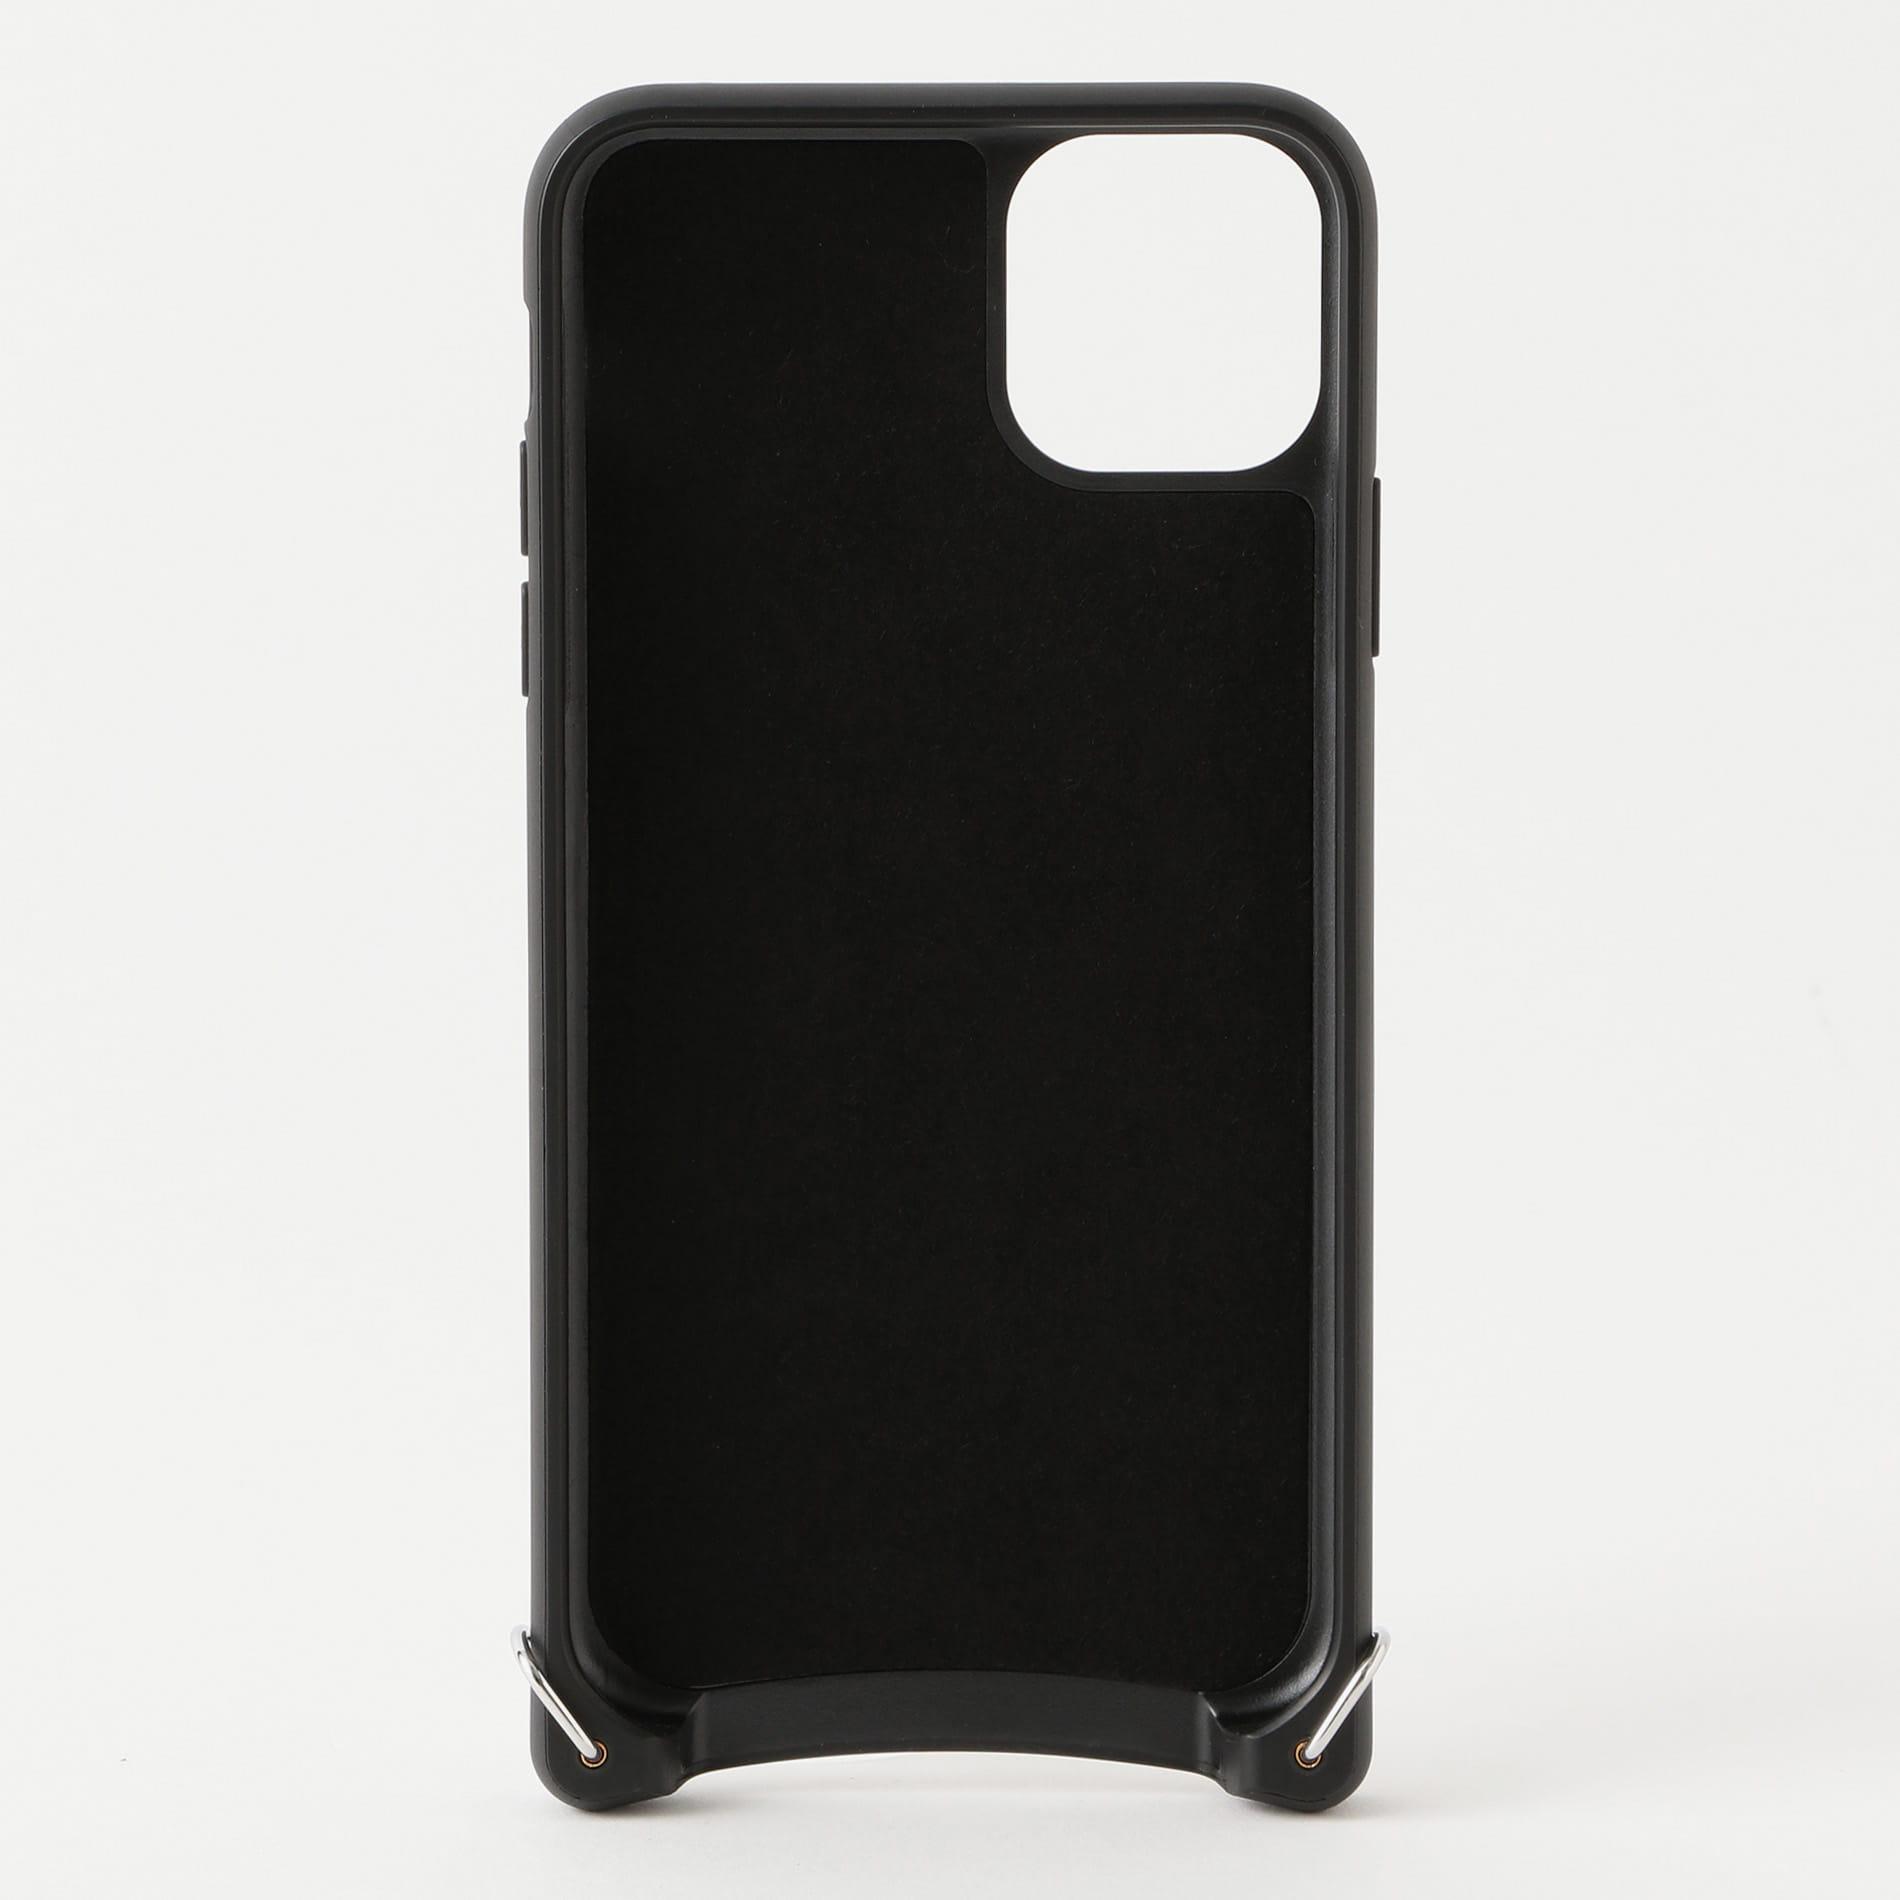 【BANDOLIER】NICOLE RICH SILVER iPhone 11 Pro Max bdl05-10nic-slv-11pm